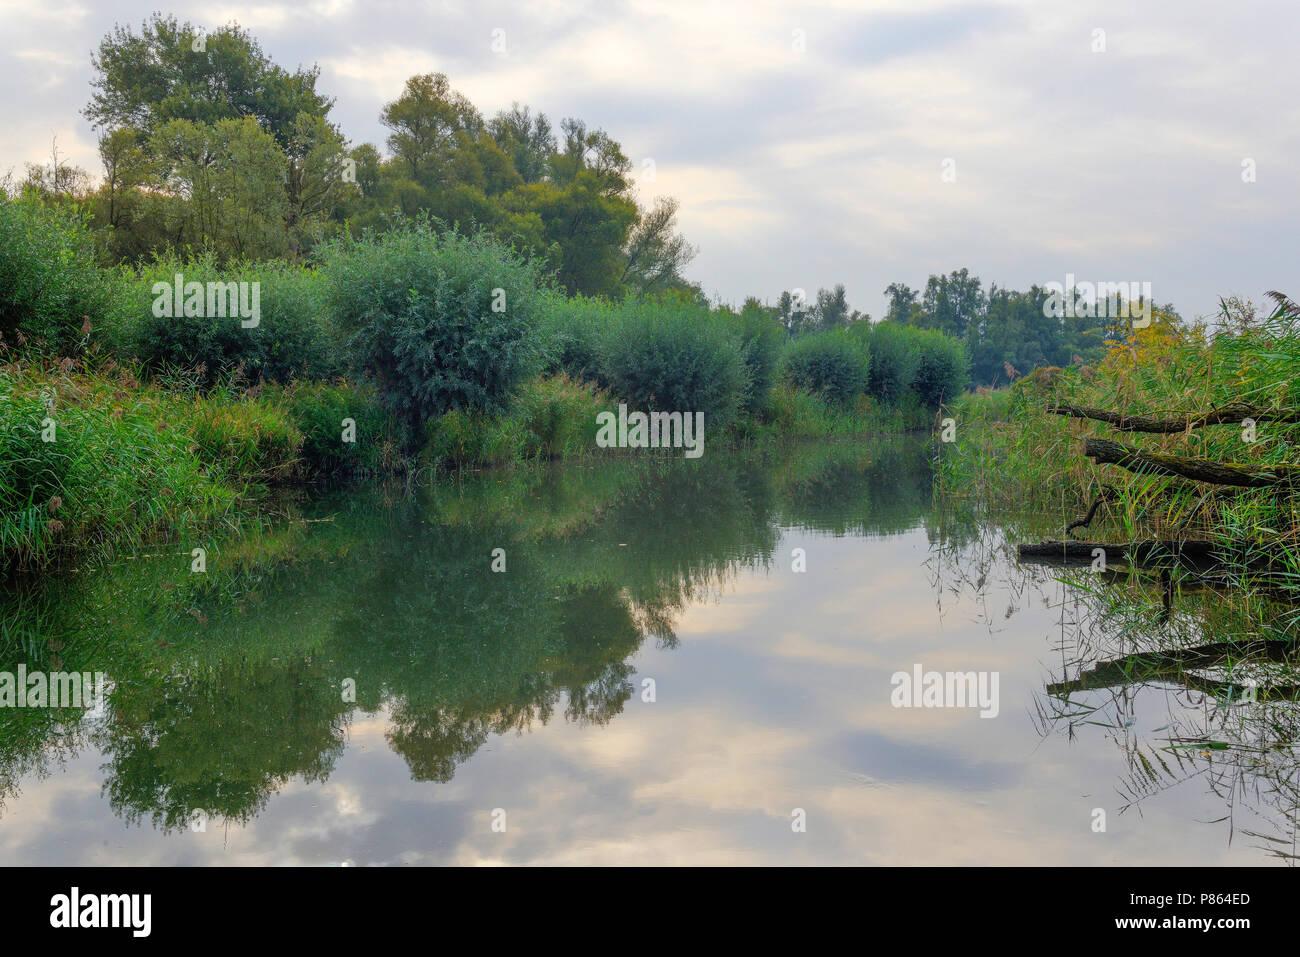 Weerspiegeling, Reflection Biesbosch - Stock Image